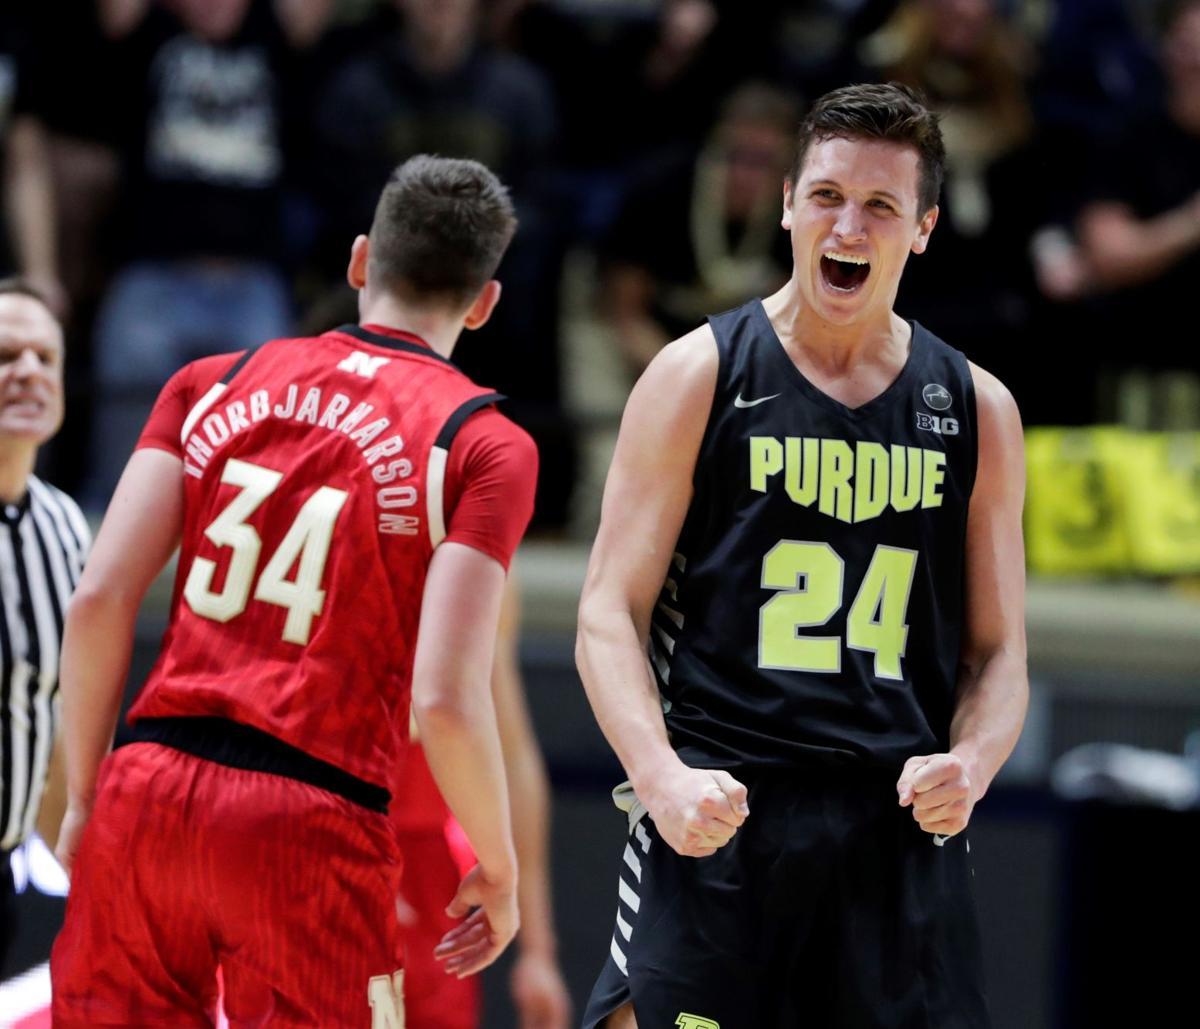 Nebraska Purdue Basketball